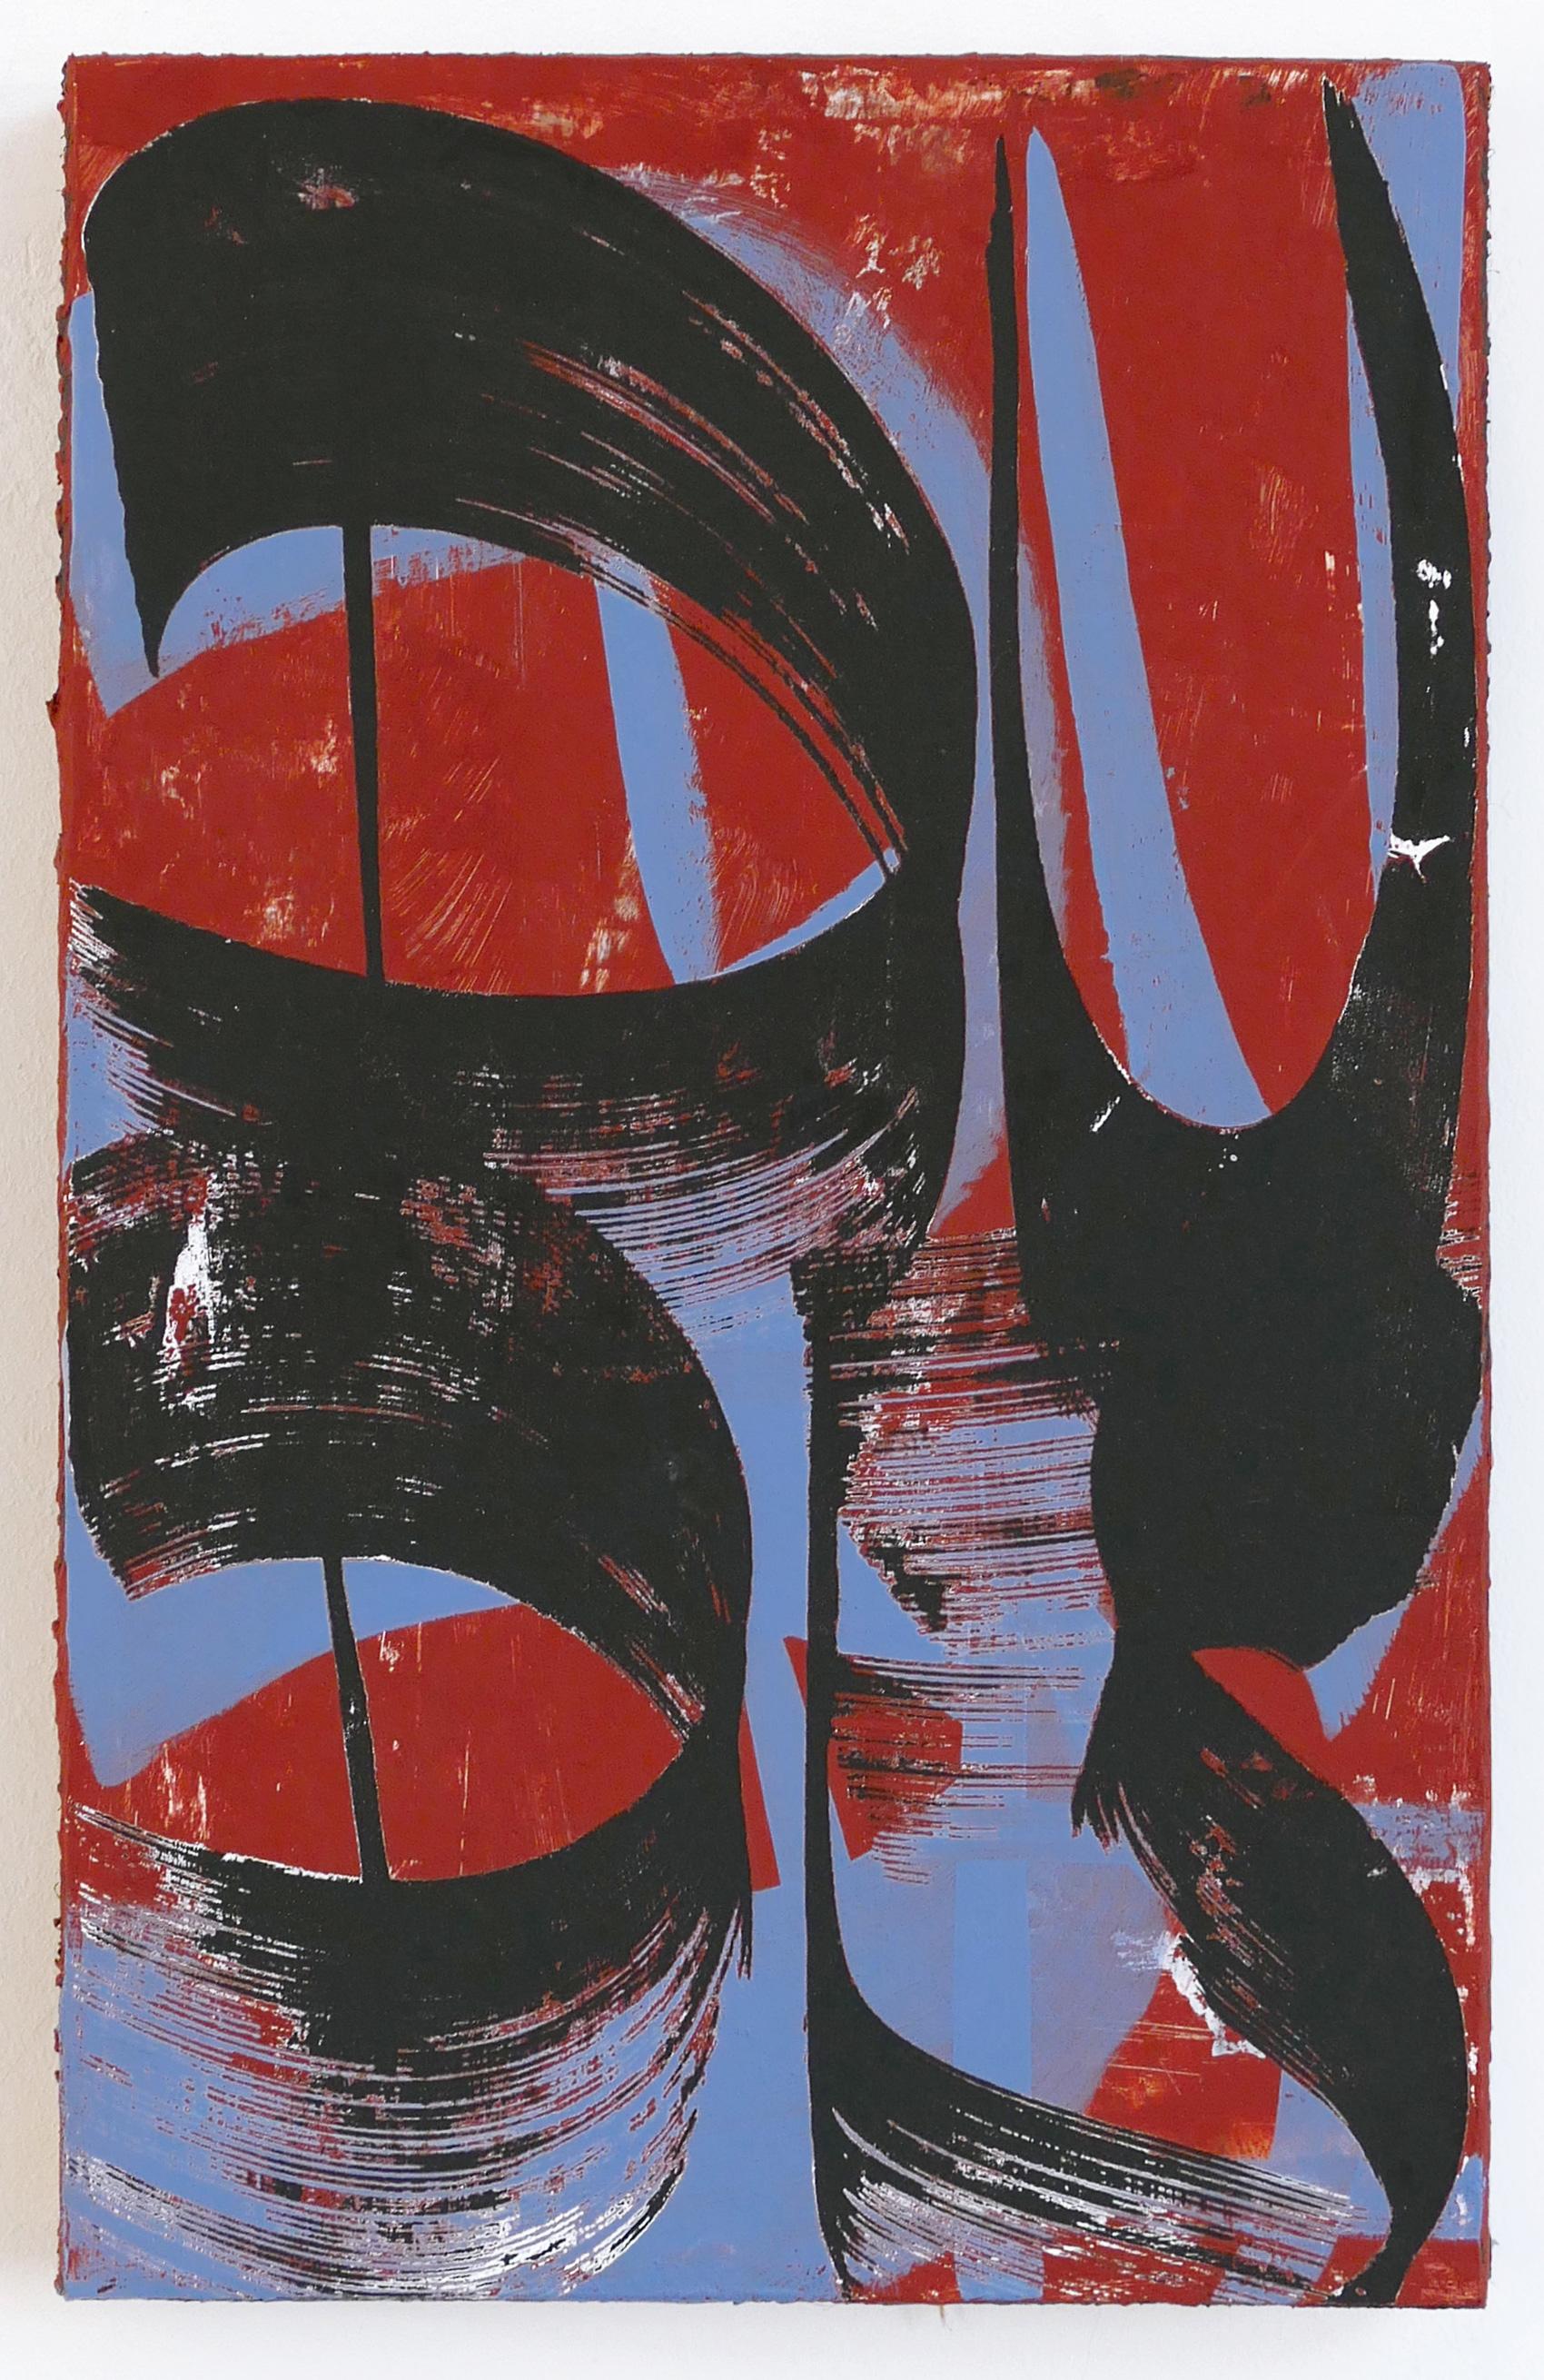 Galerie Barbara Thumm \ New Viewings #21 \ Marina Faust and Nicolas Jasmin